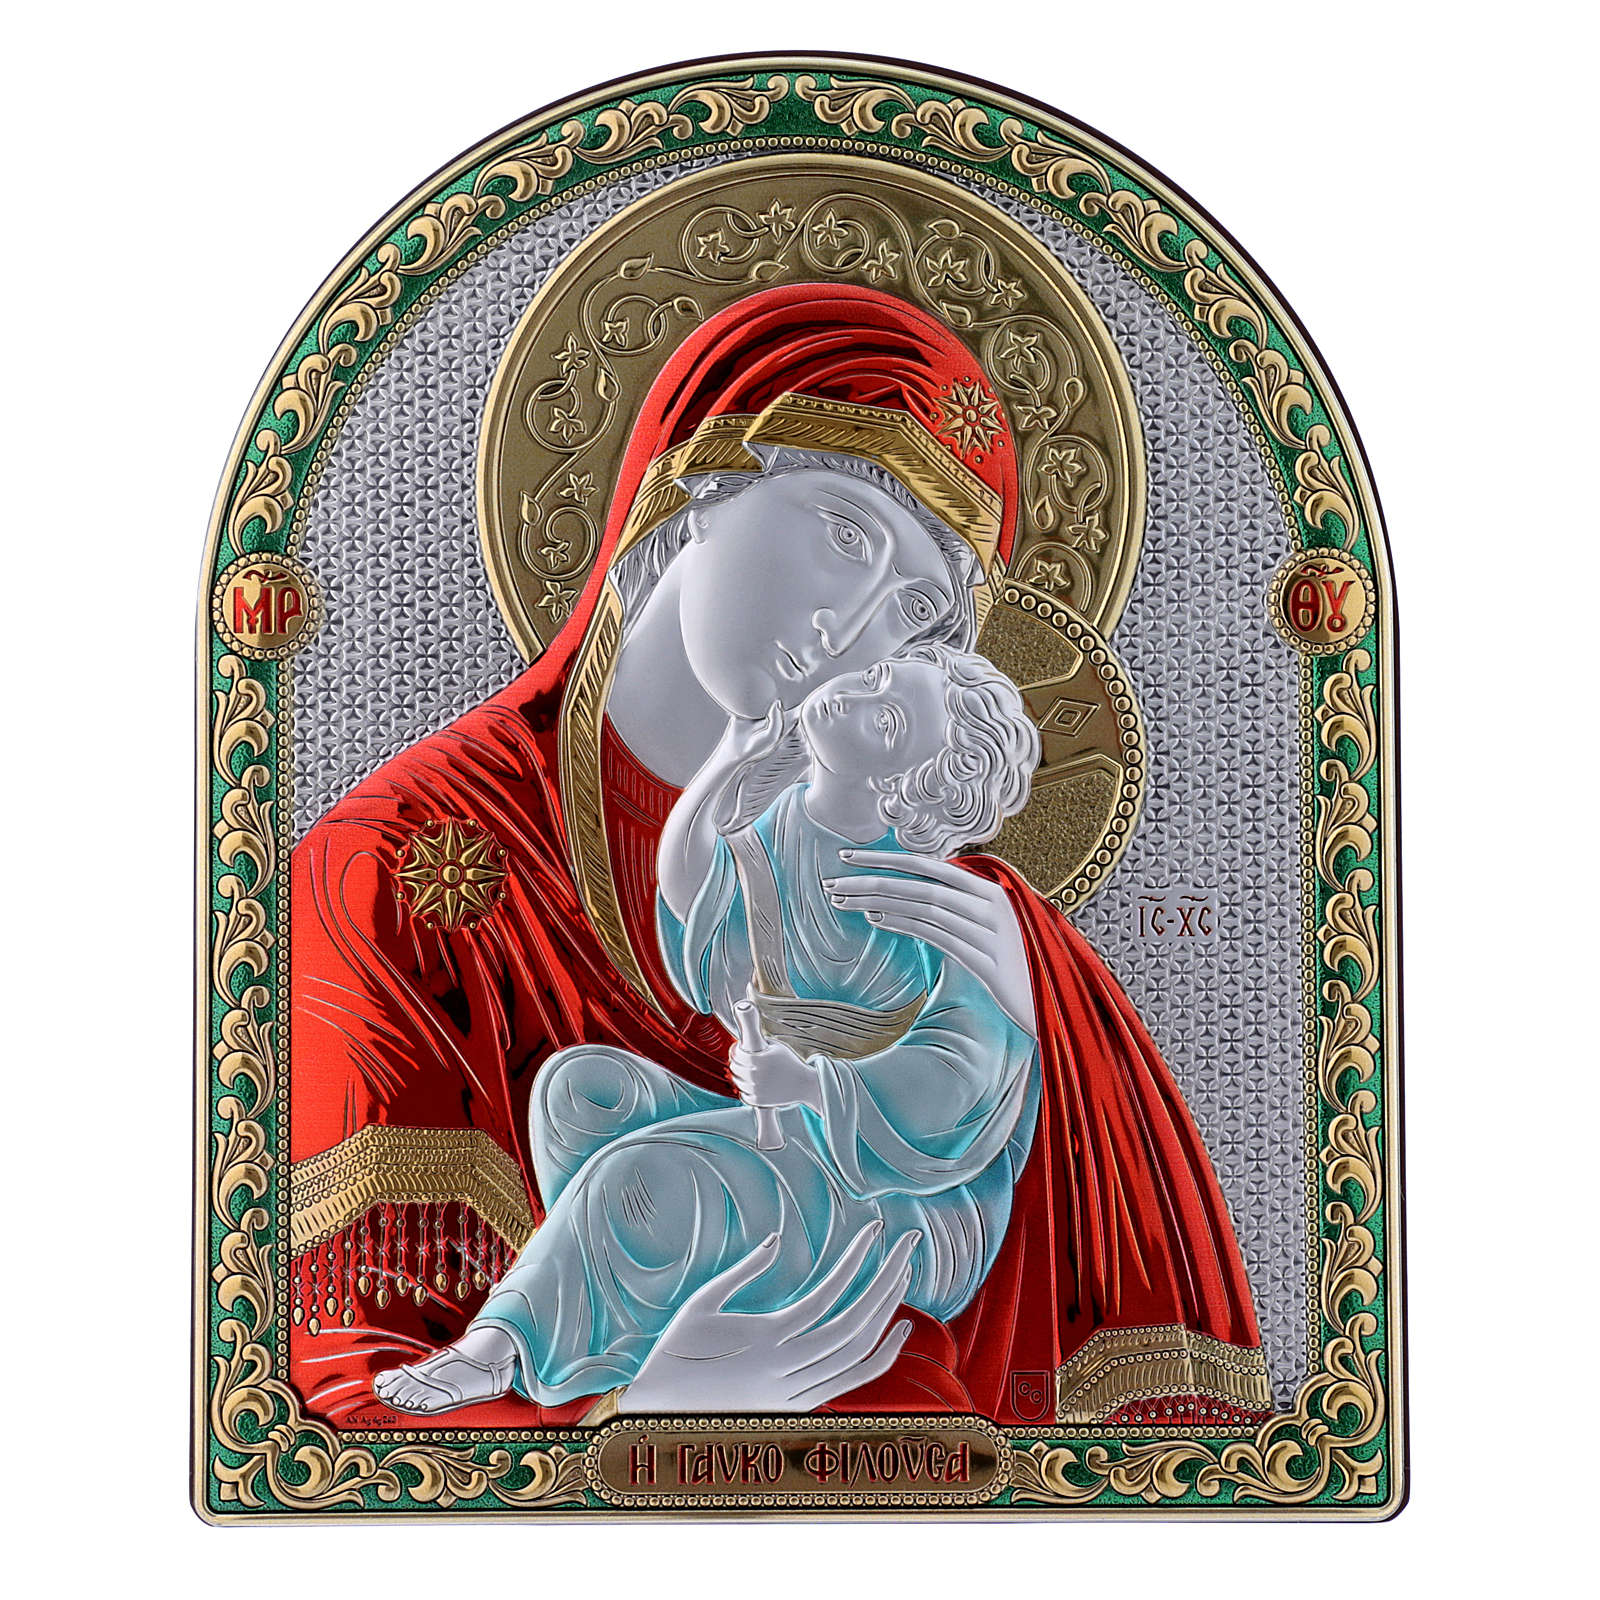 Cuadro bilaminado parte posterior madera preciosa detalles oro Virgen Vladimir roja 24,5x20 cm 4